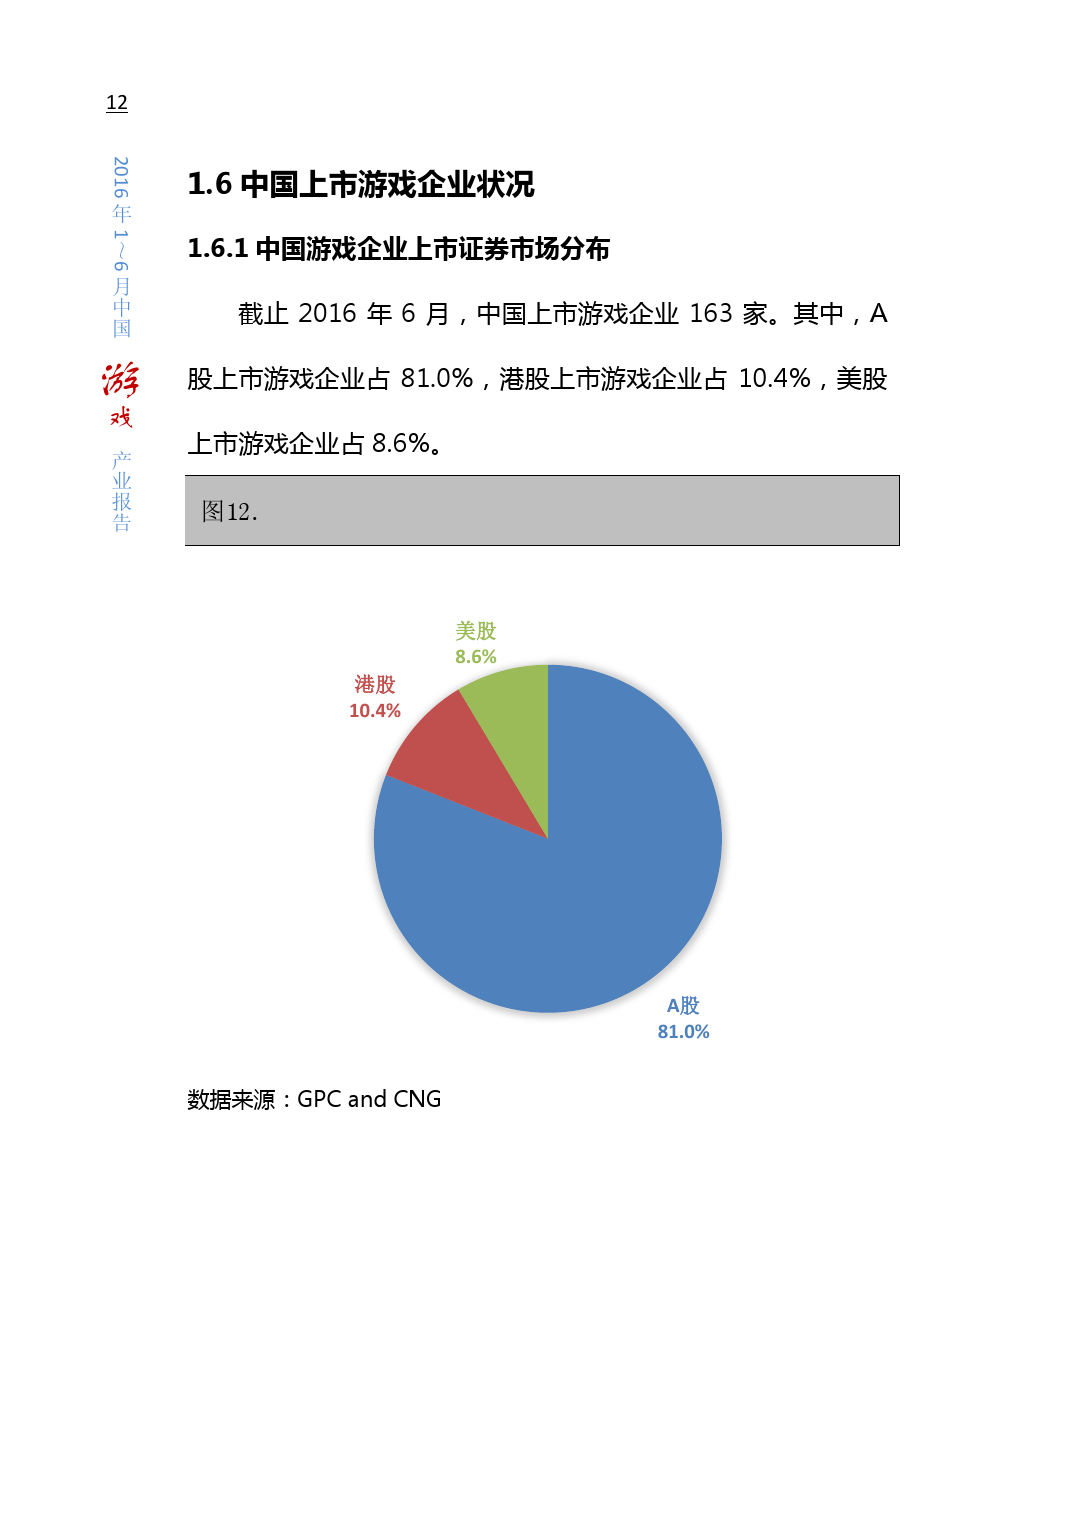 2016%e5%b9%b41-6%e6%9c%88%e4%b8%ad%e5%9b%bd%e4%ba%a7%e4%b8%9a%e6%b8%b8%e6%88%8f%e6%8a%a5%e5%91%8a_000026